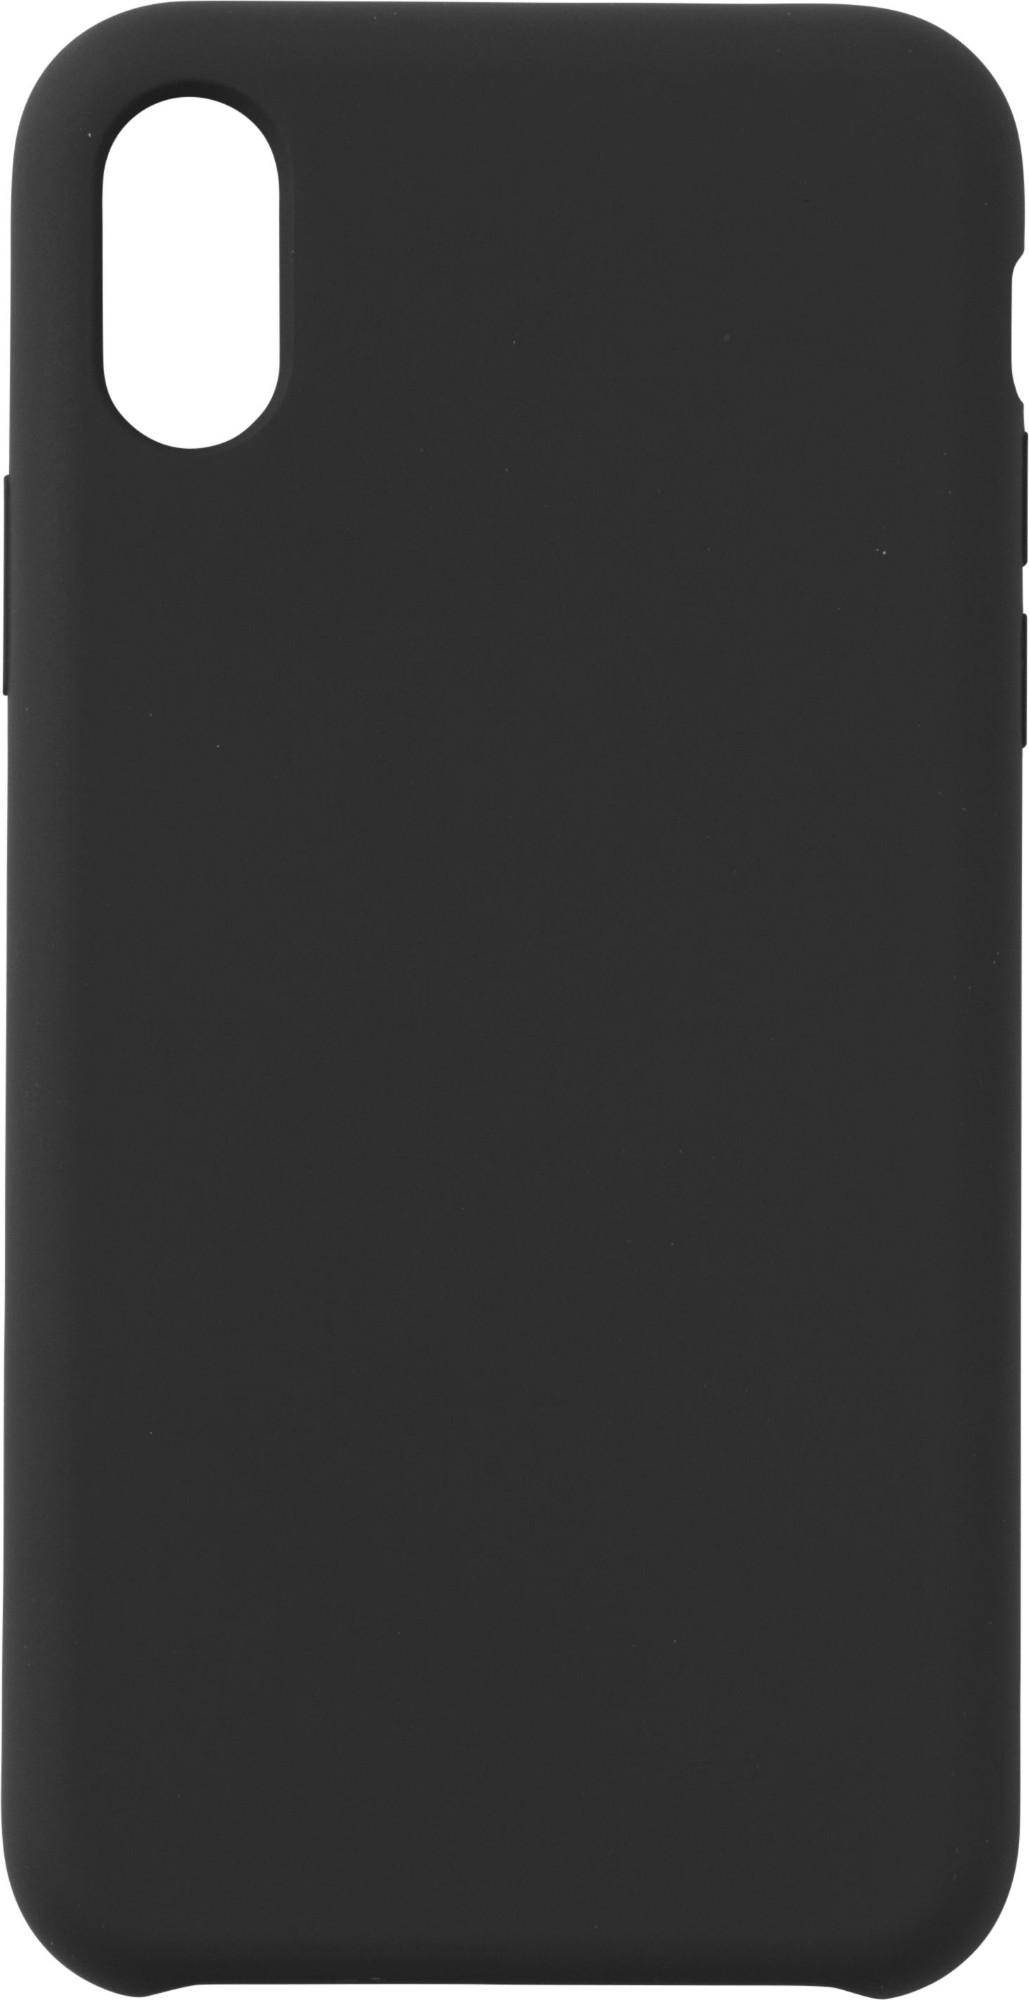 eSTUFF ES671127 mobile phone case Cover Grey